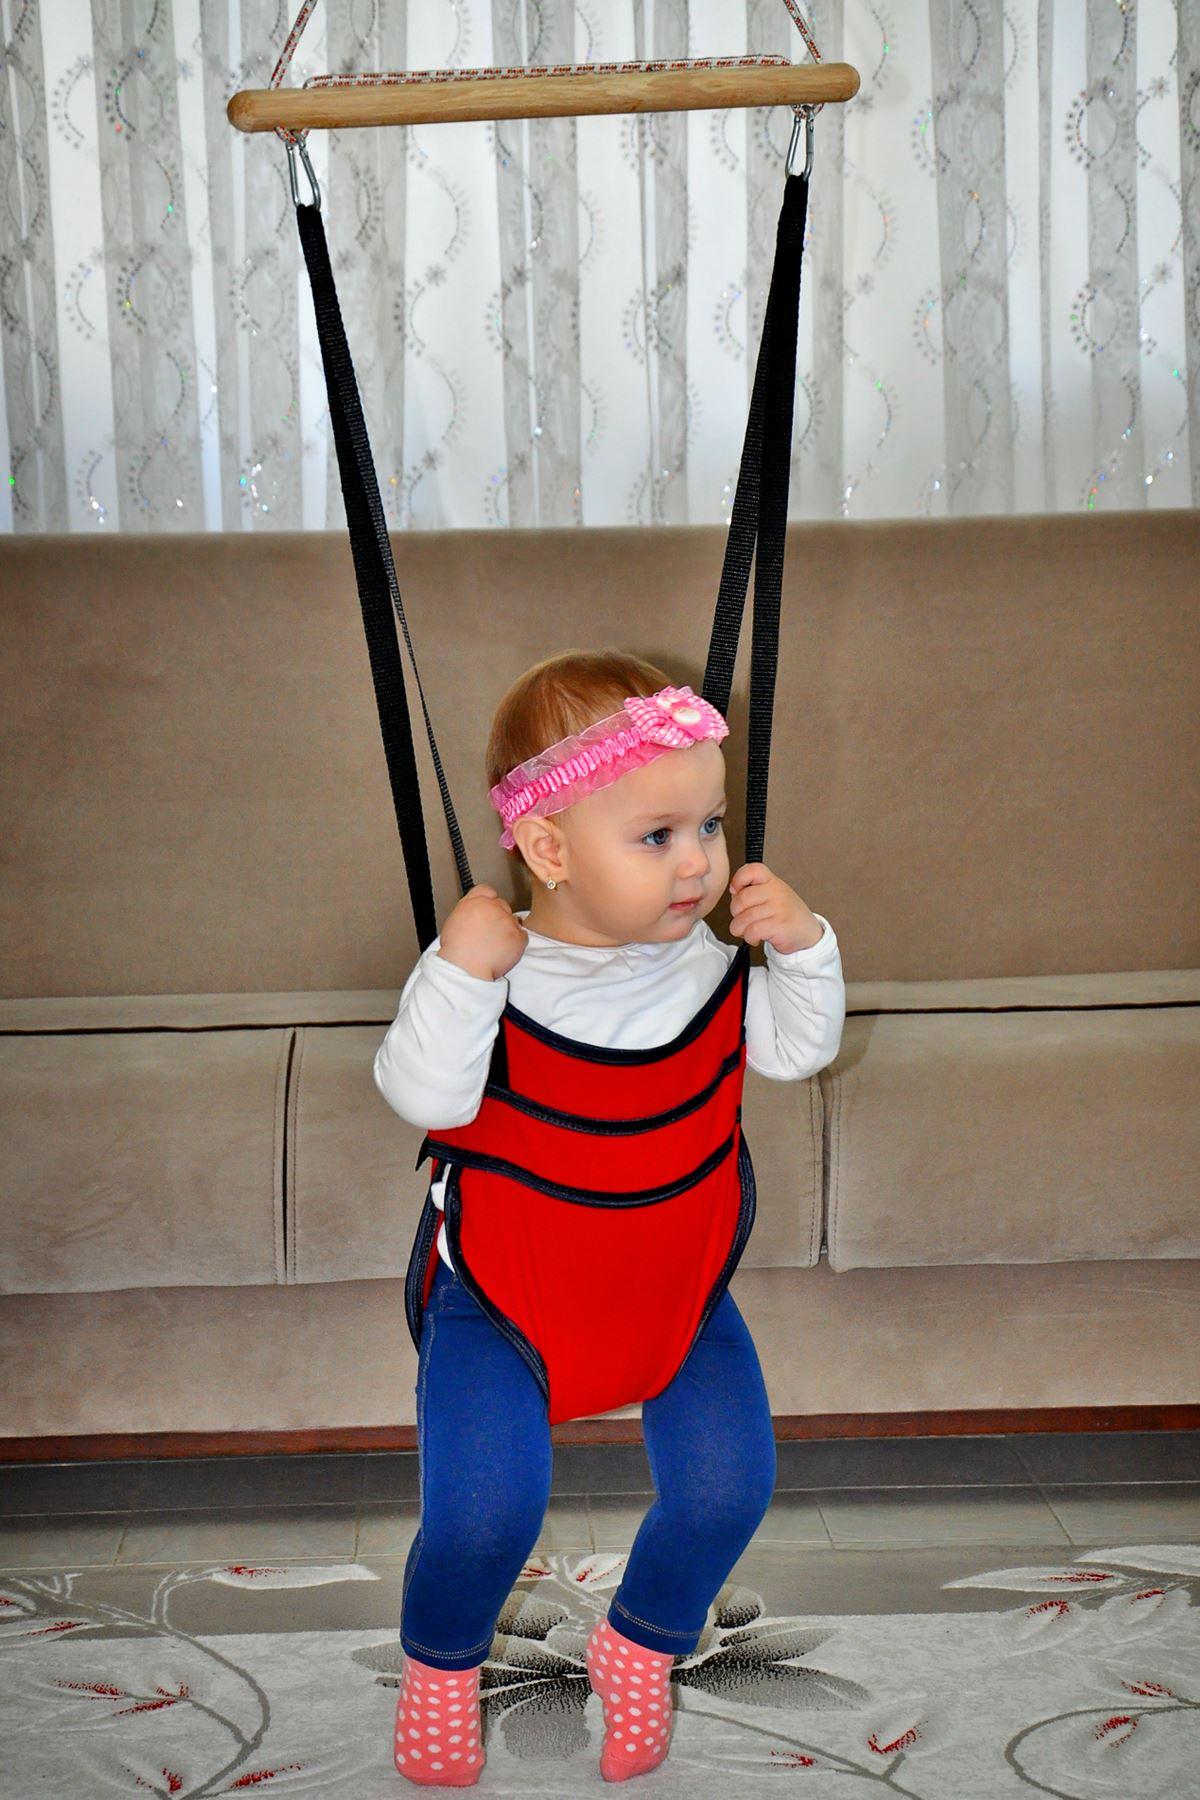 Bundera Bella Red Baby Whoops Hoppy Walker